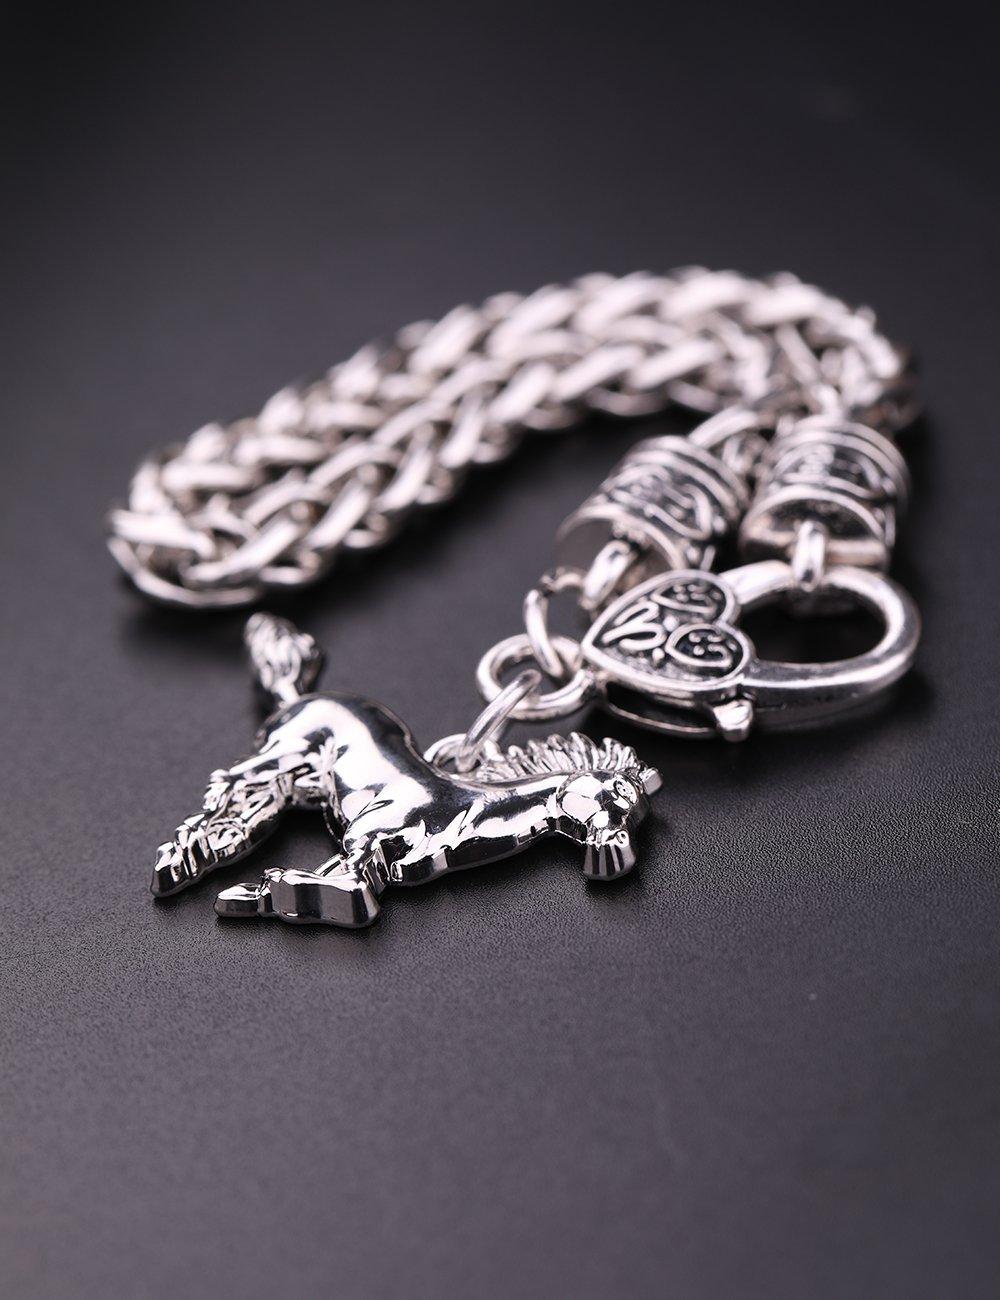 VASSAGO Vintage Norse Viking Runes Axes Helmet Mask Celtic Irish Knot Pendant Amulet Wheat Chain Bracelet